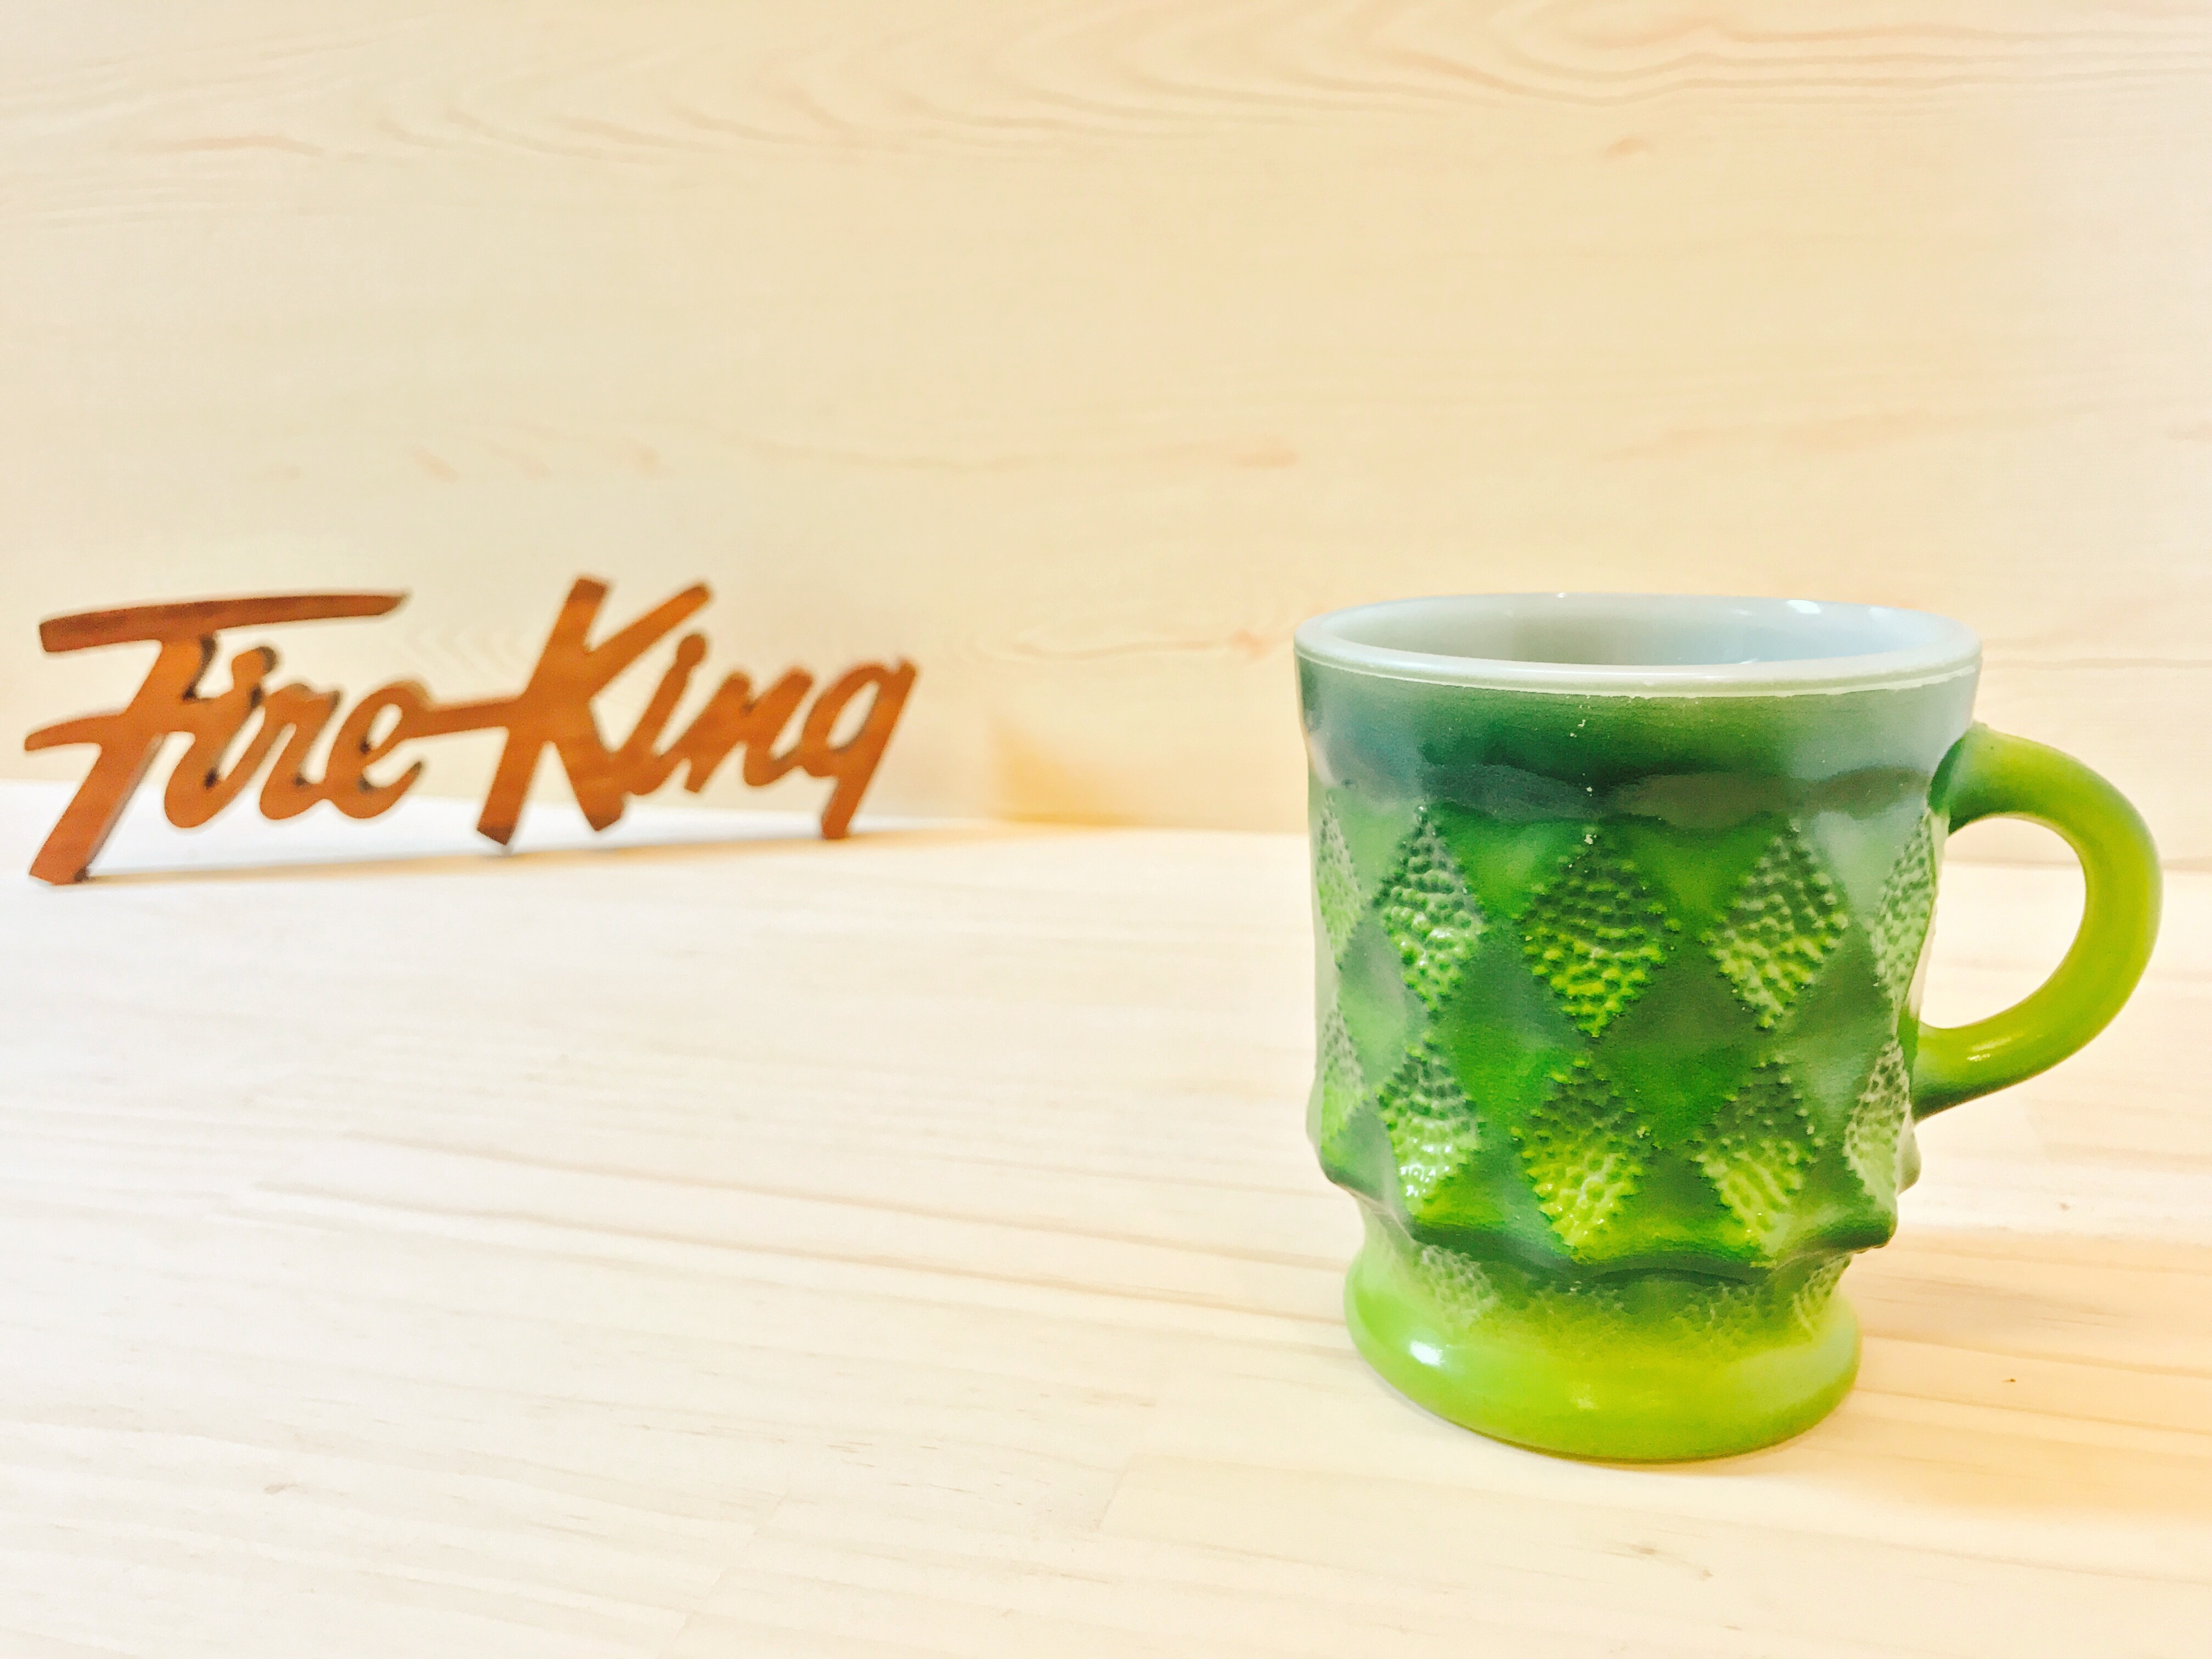 "[Fire King] ダイヤモンドマグ ""キンバリー"" グリーン・ライム ミルクガラス (識別No.22001)"